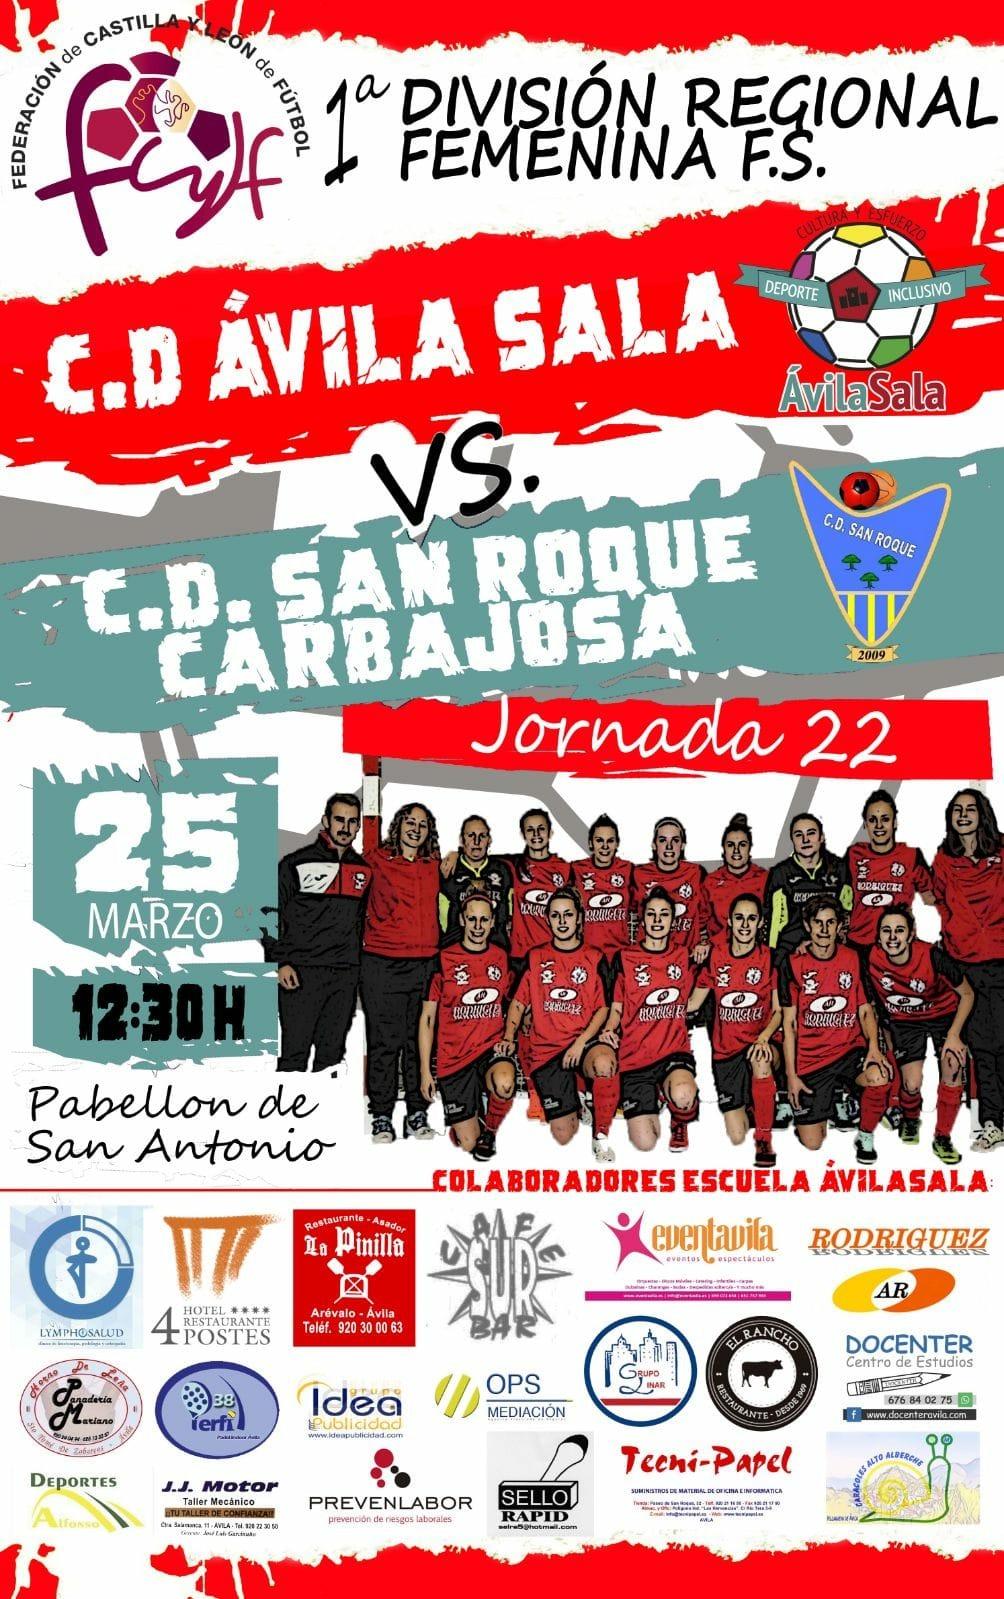 C.D.AvilaSala vs C.D.San Roque Carbajosa